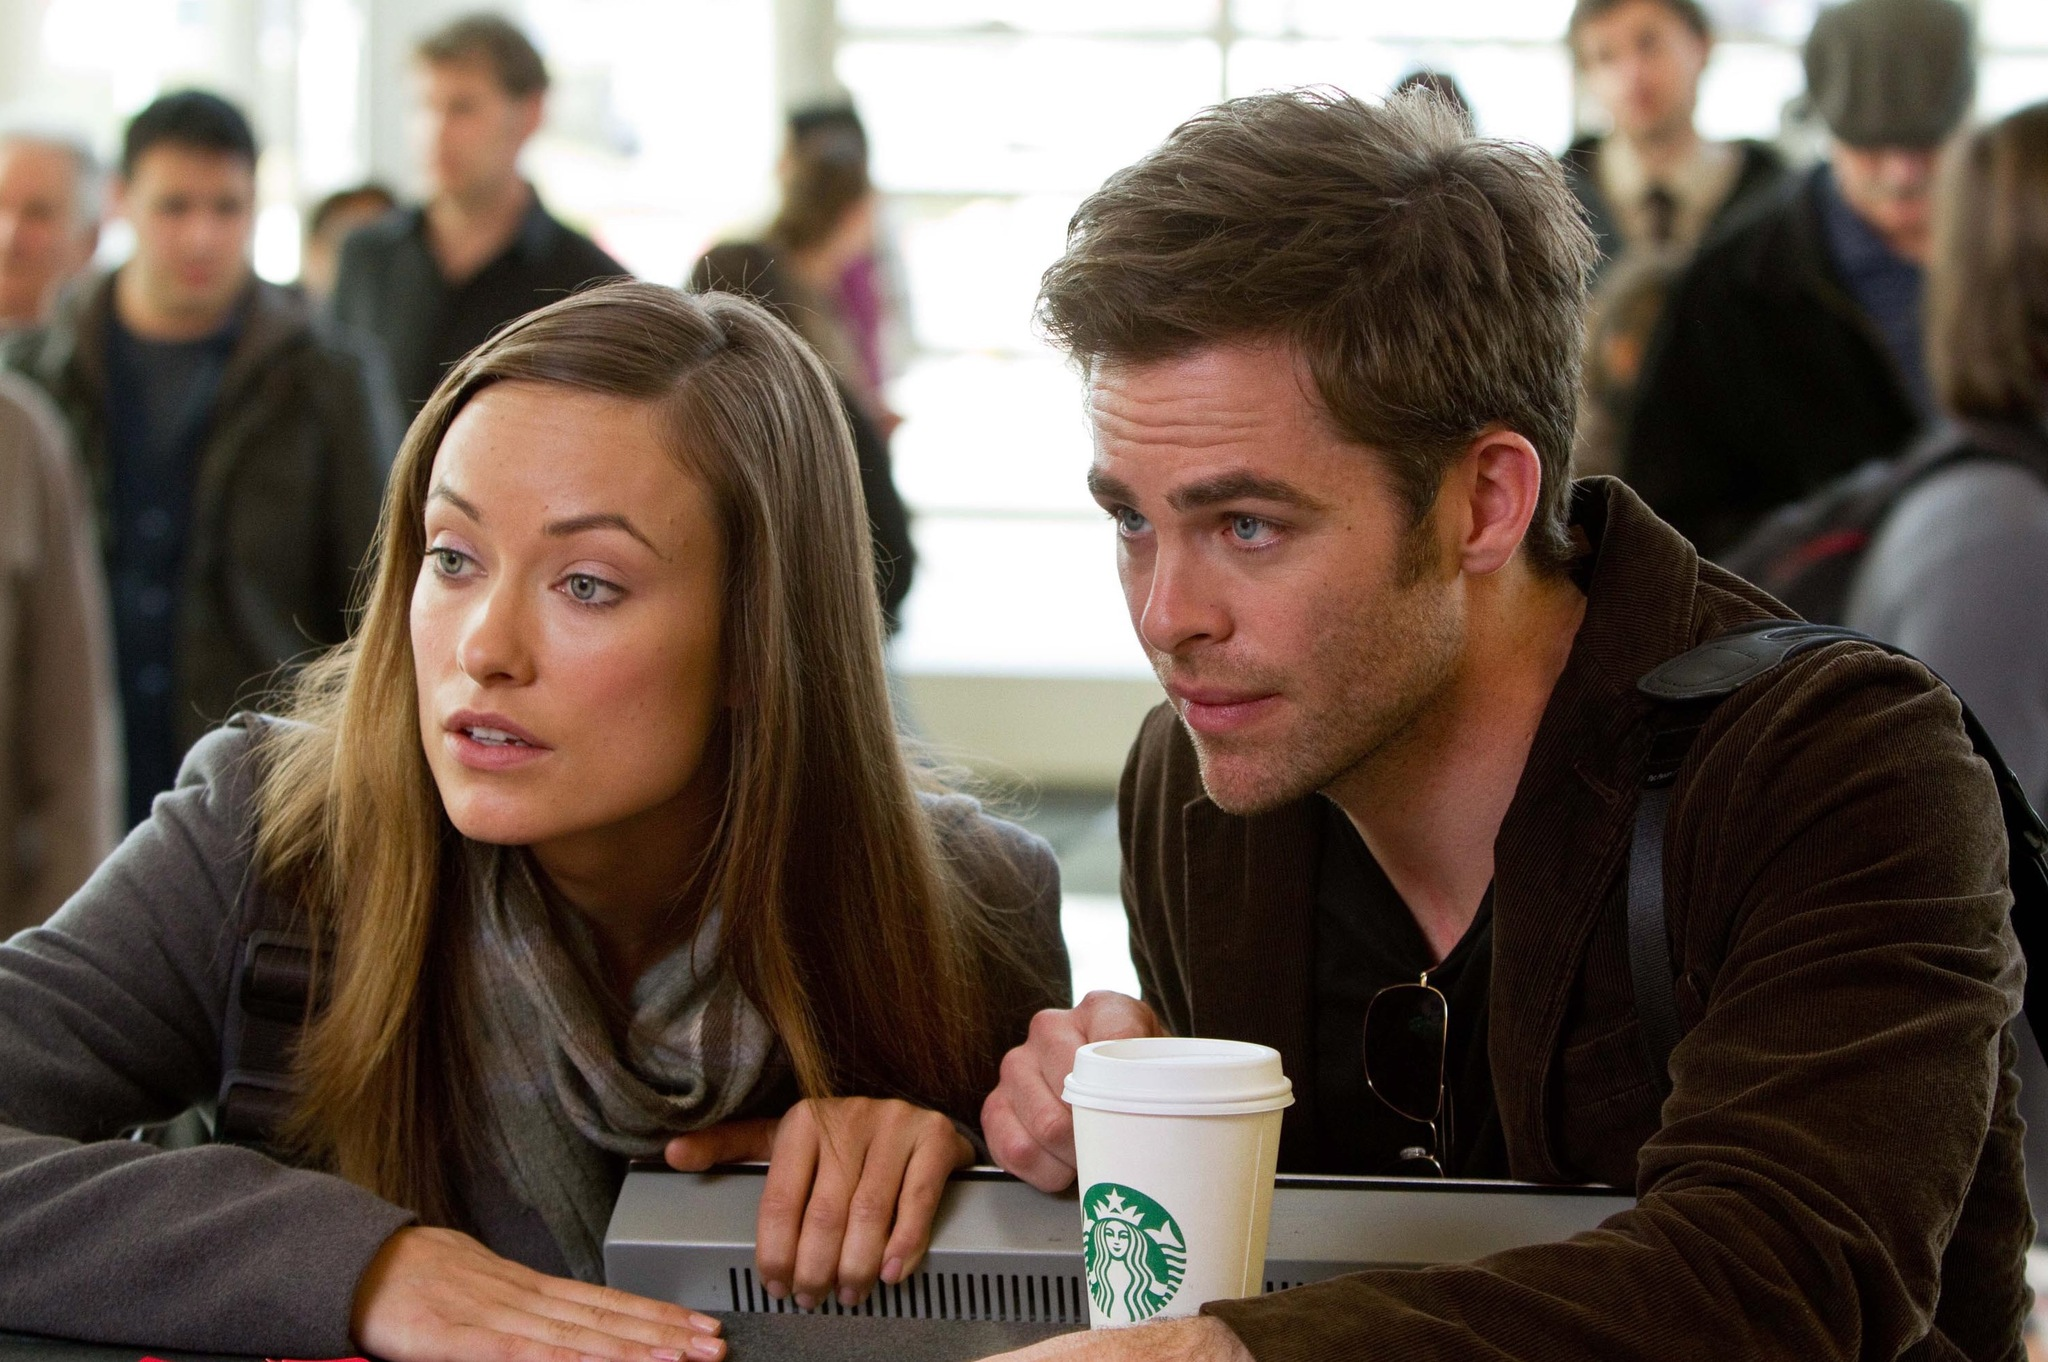 Olivia Wilde and Chris Pine in People Like Us (2012)